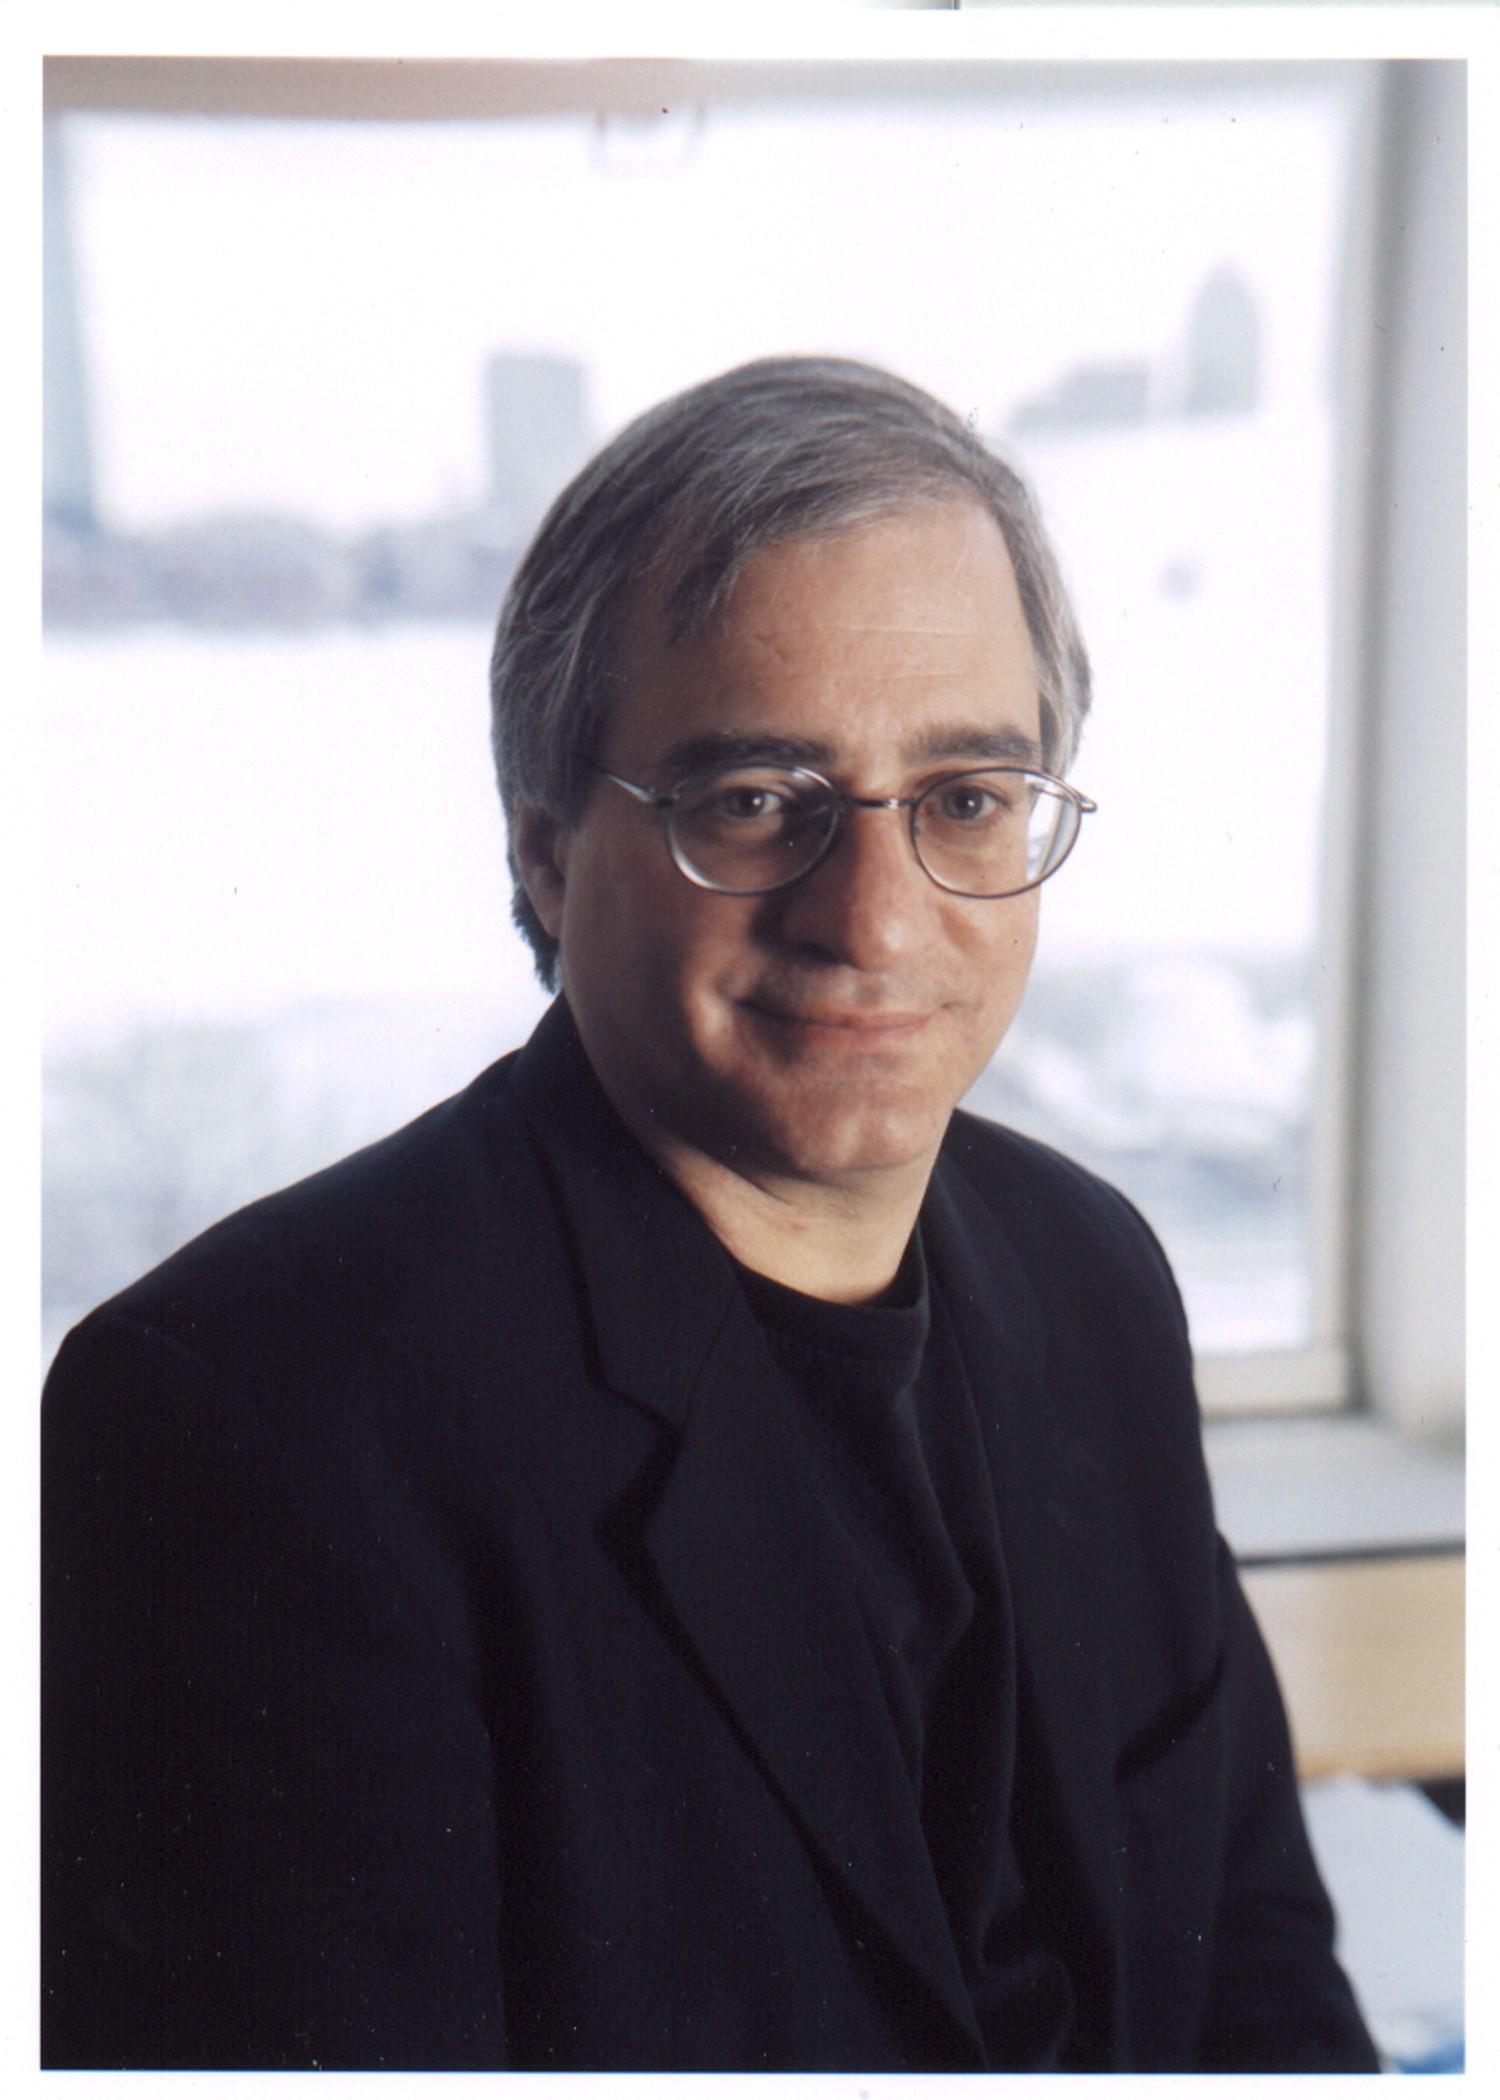 Michael A. Cusumano